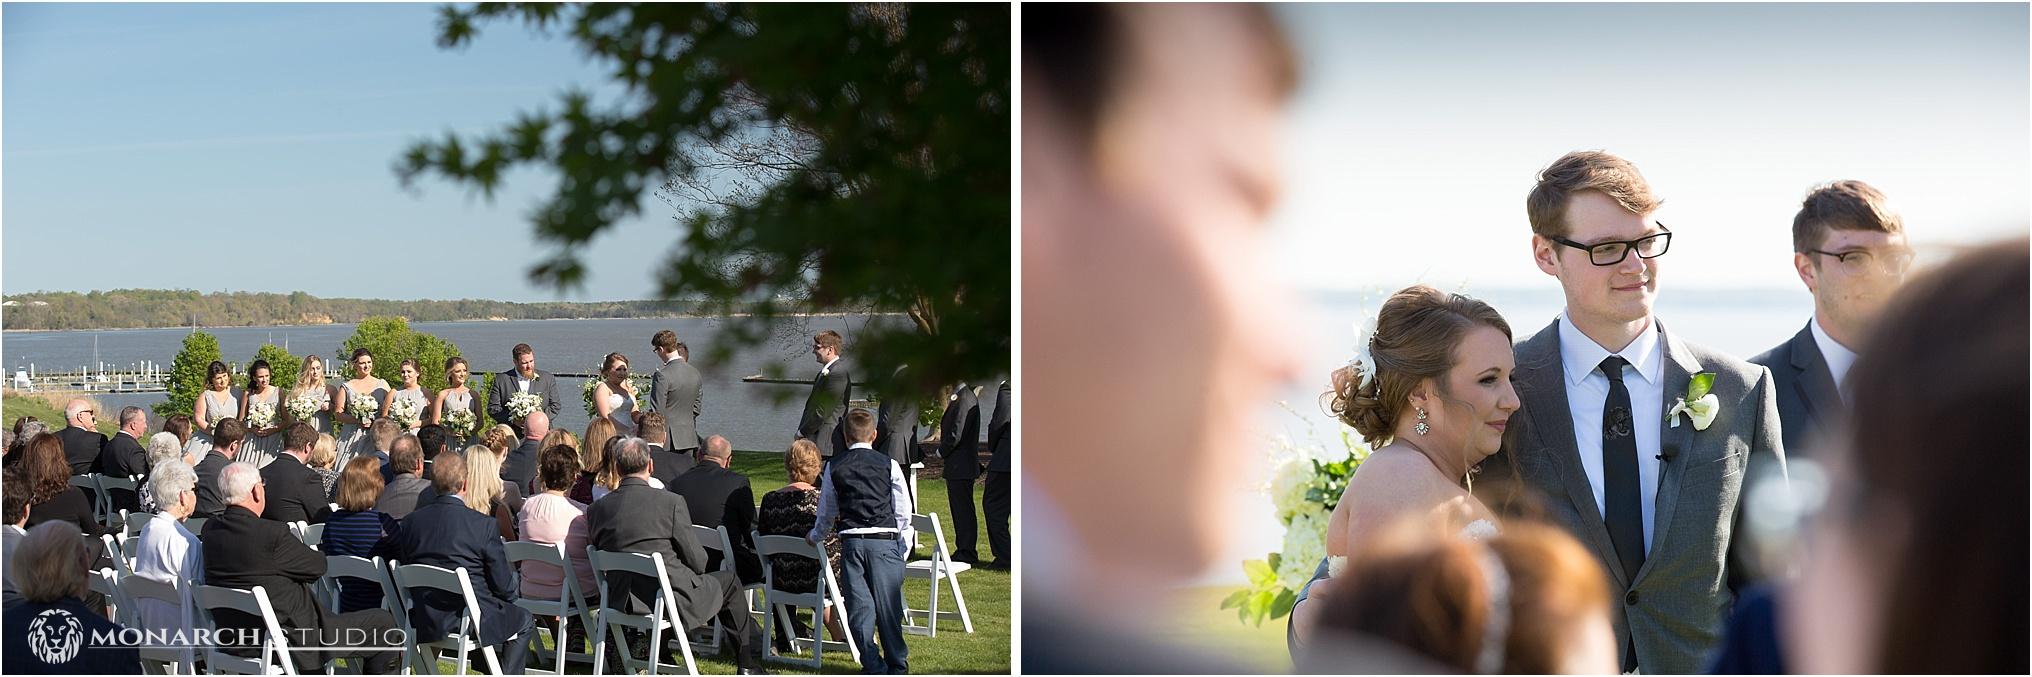 williamsburg-virginia-wedding-photographer-056.jpg